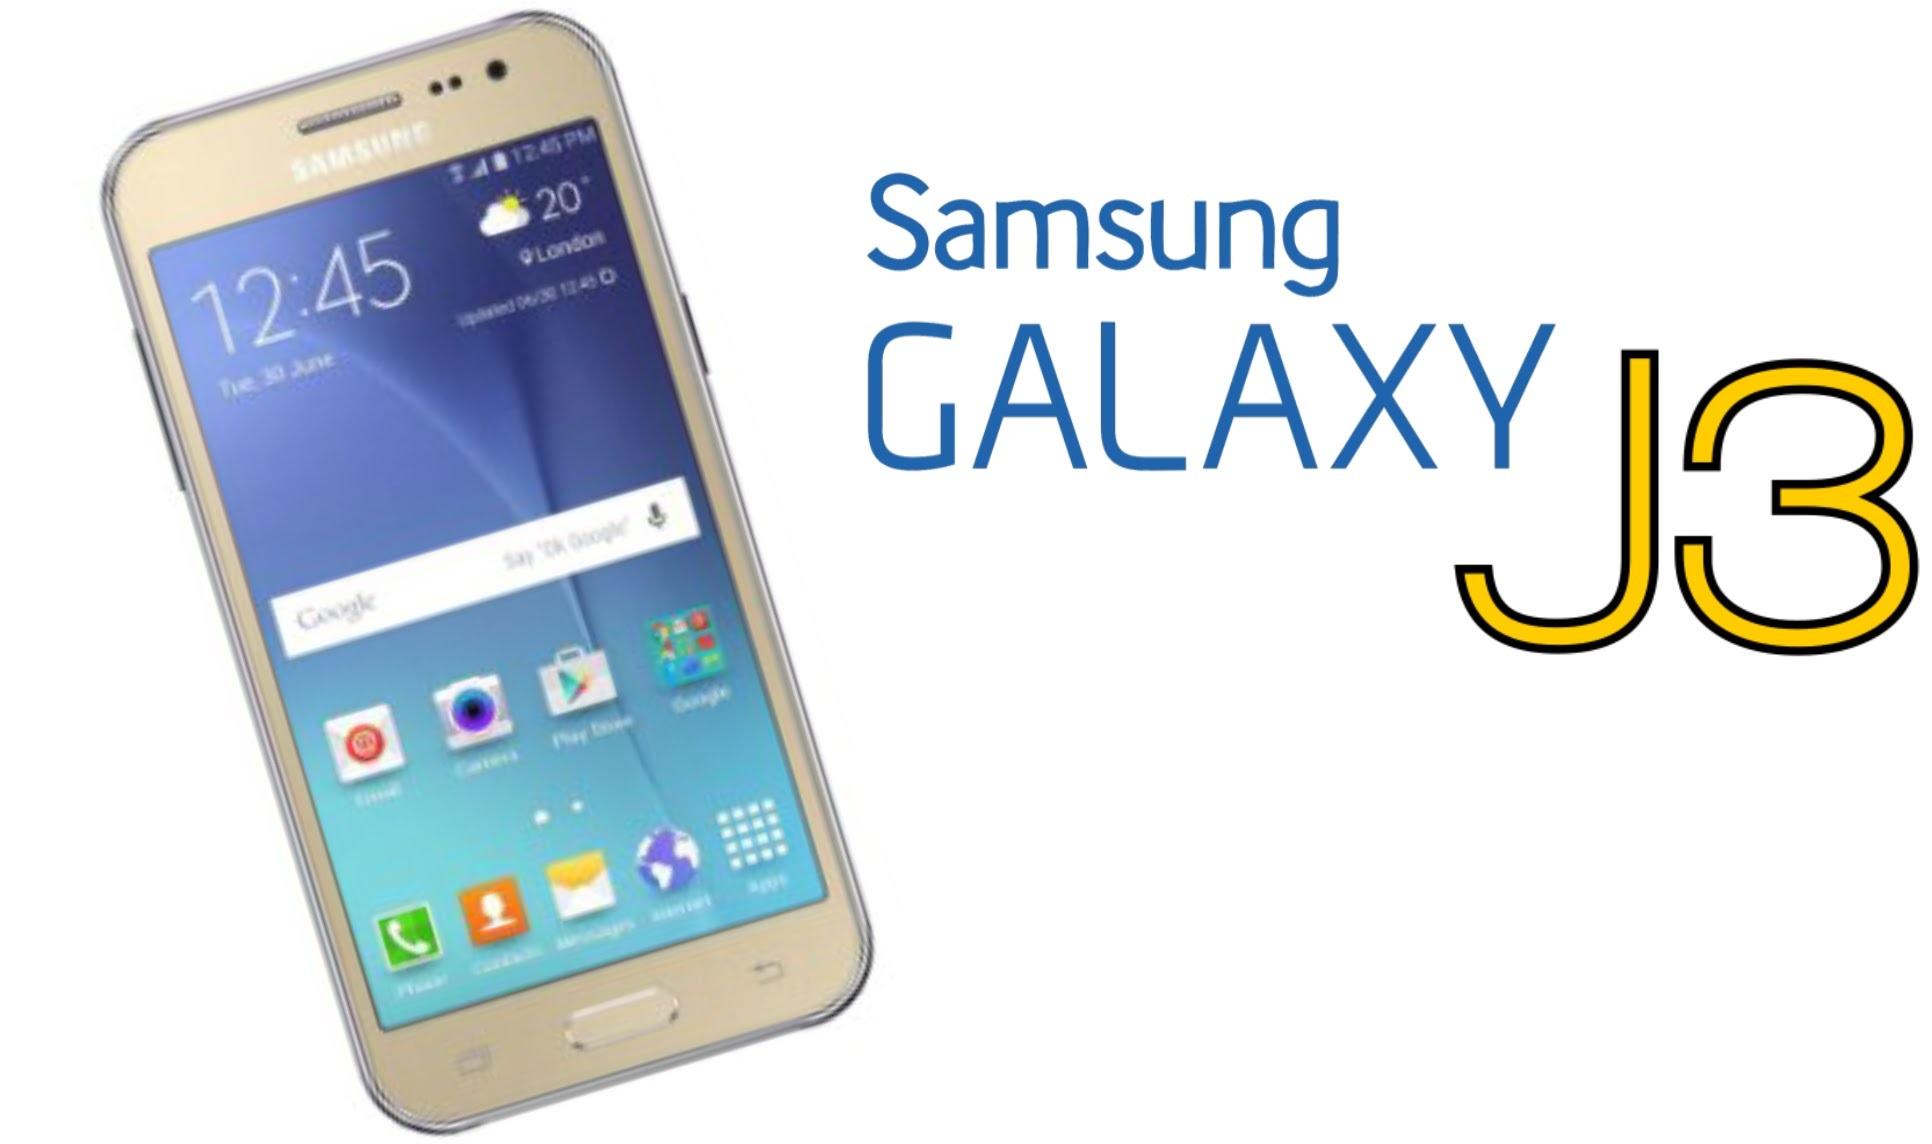 Samsang galaxy j3 - SAMSUNG GALAXY J3 (2016) User Review